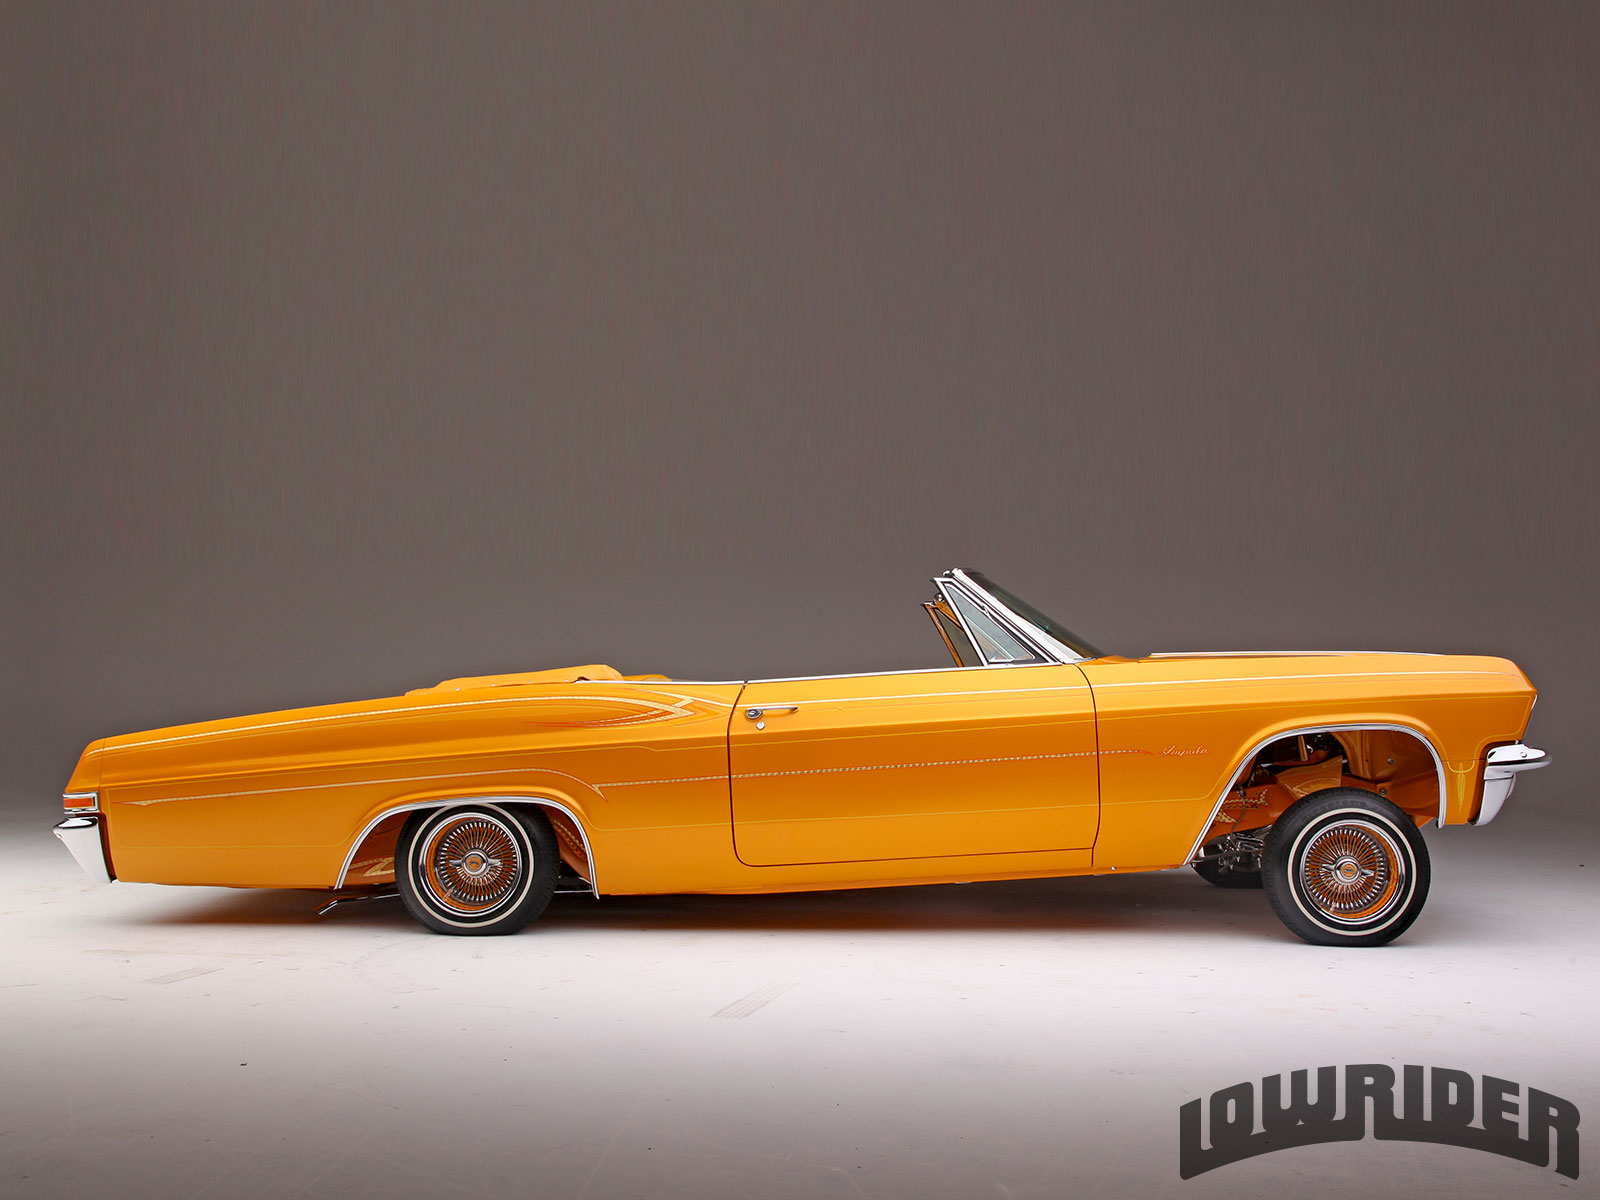 1965 Chevrolet Impala - Lowrider Magazine